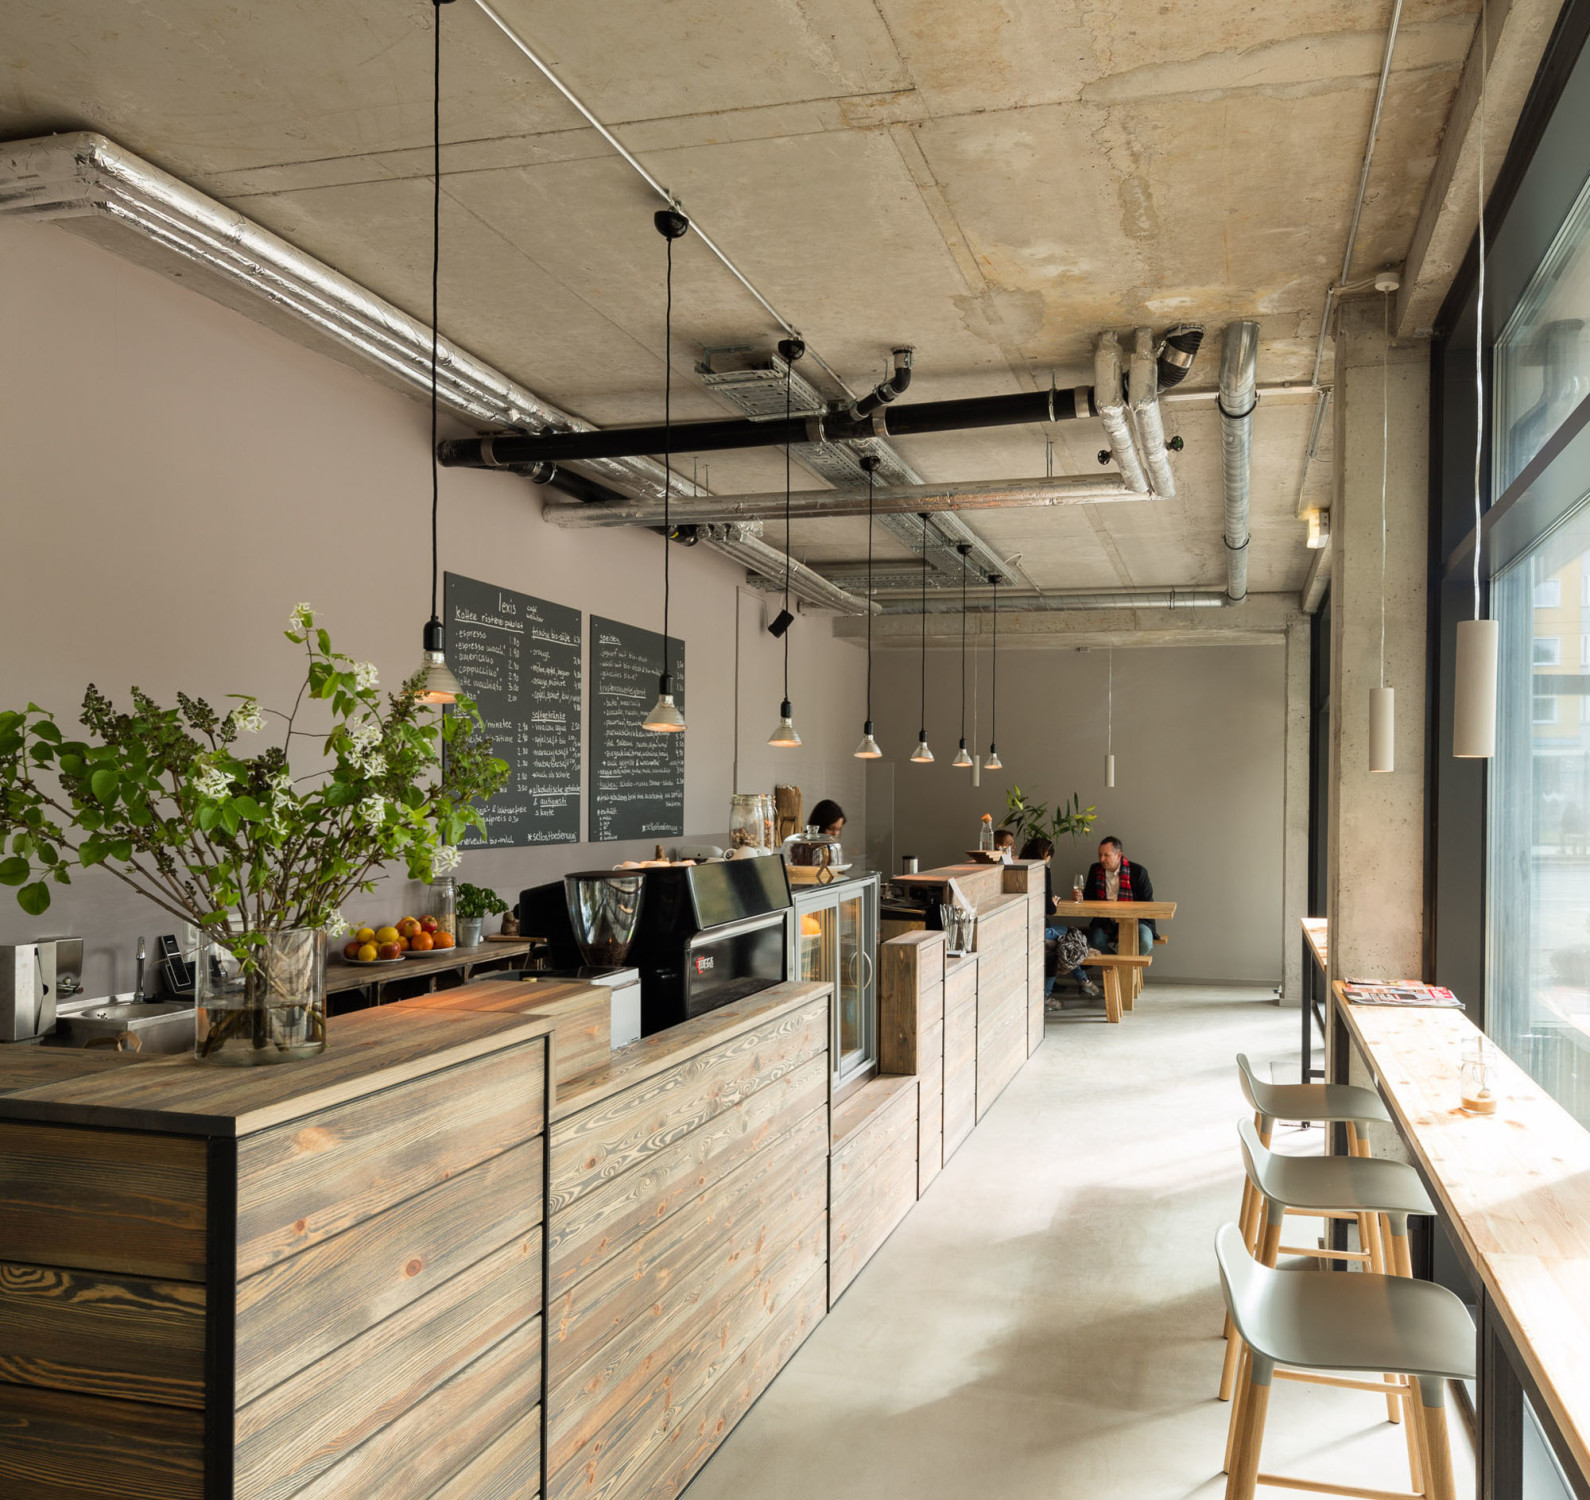 Paragon Apartments: Paragon-Apartments In Berlin